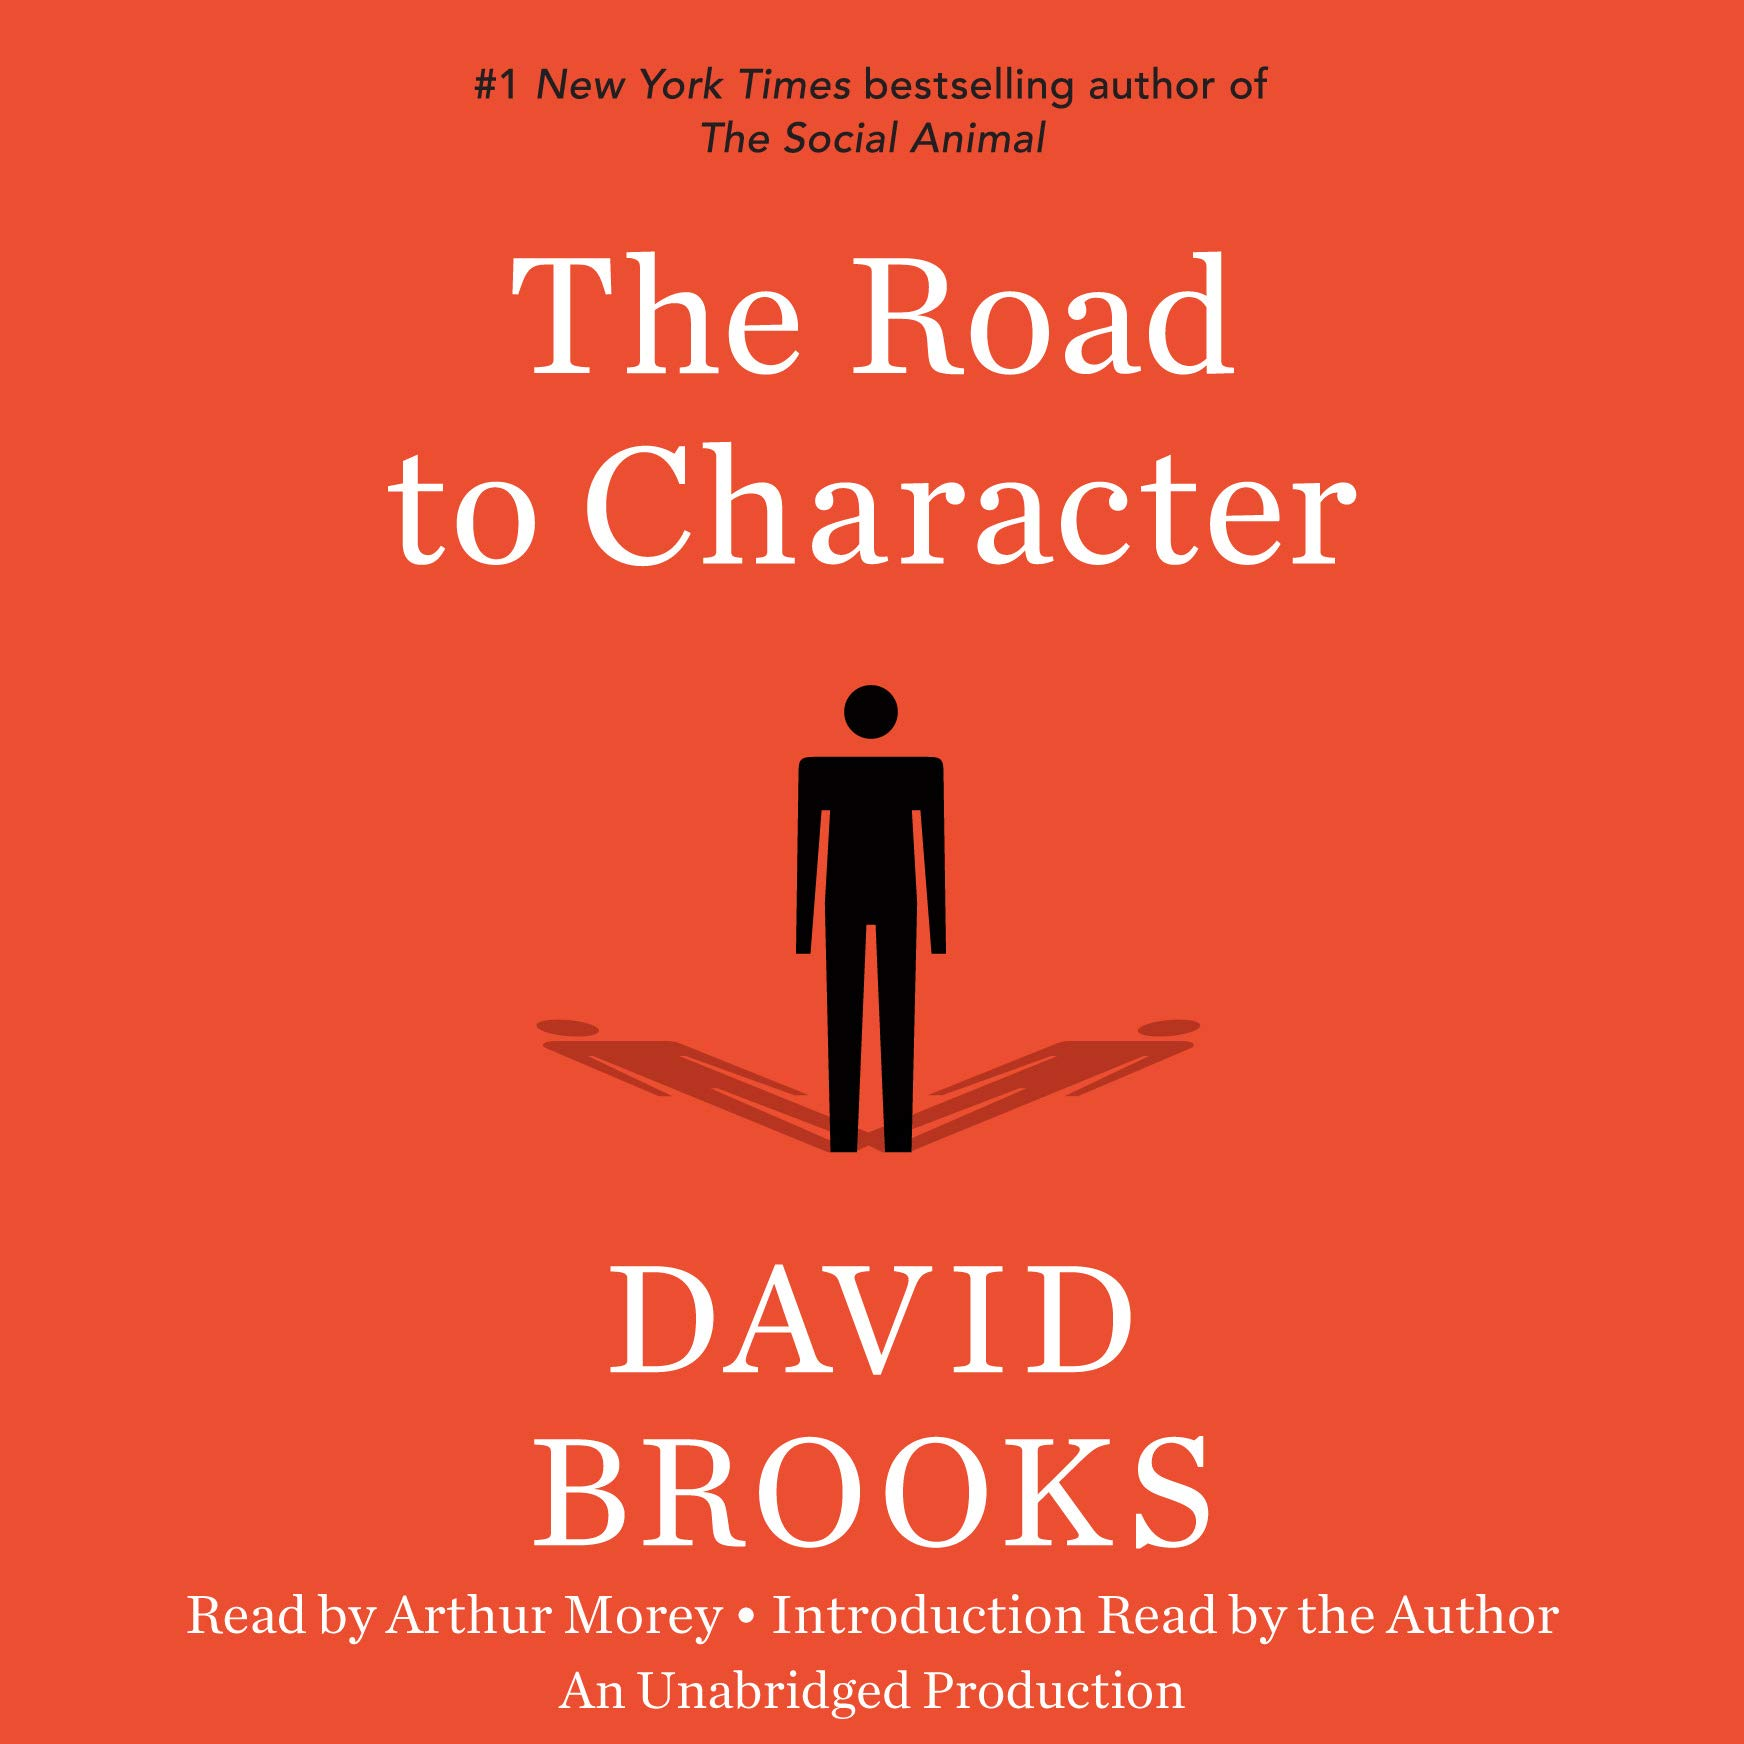 eccb821717934 Amazon.fr - The Road to Character - David Brooks, Arthur Morey - Livres